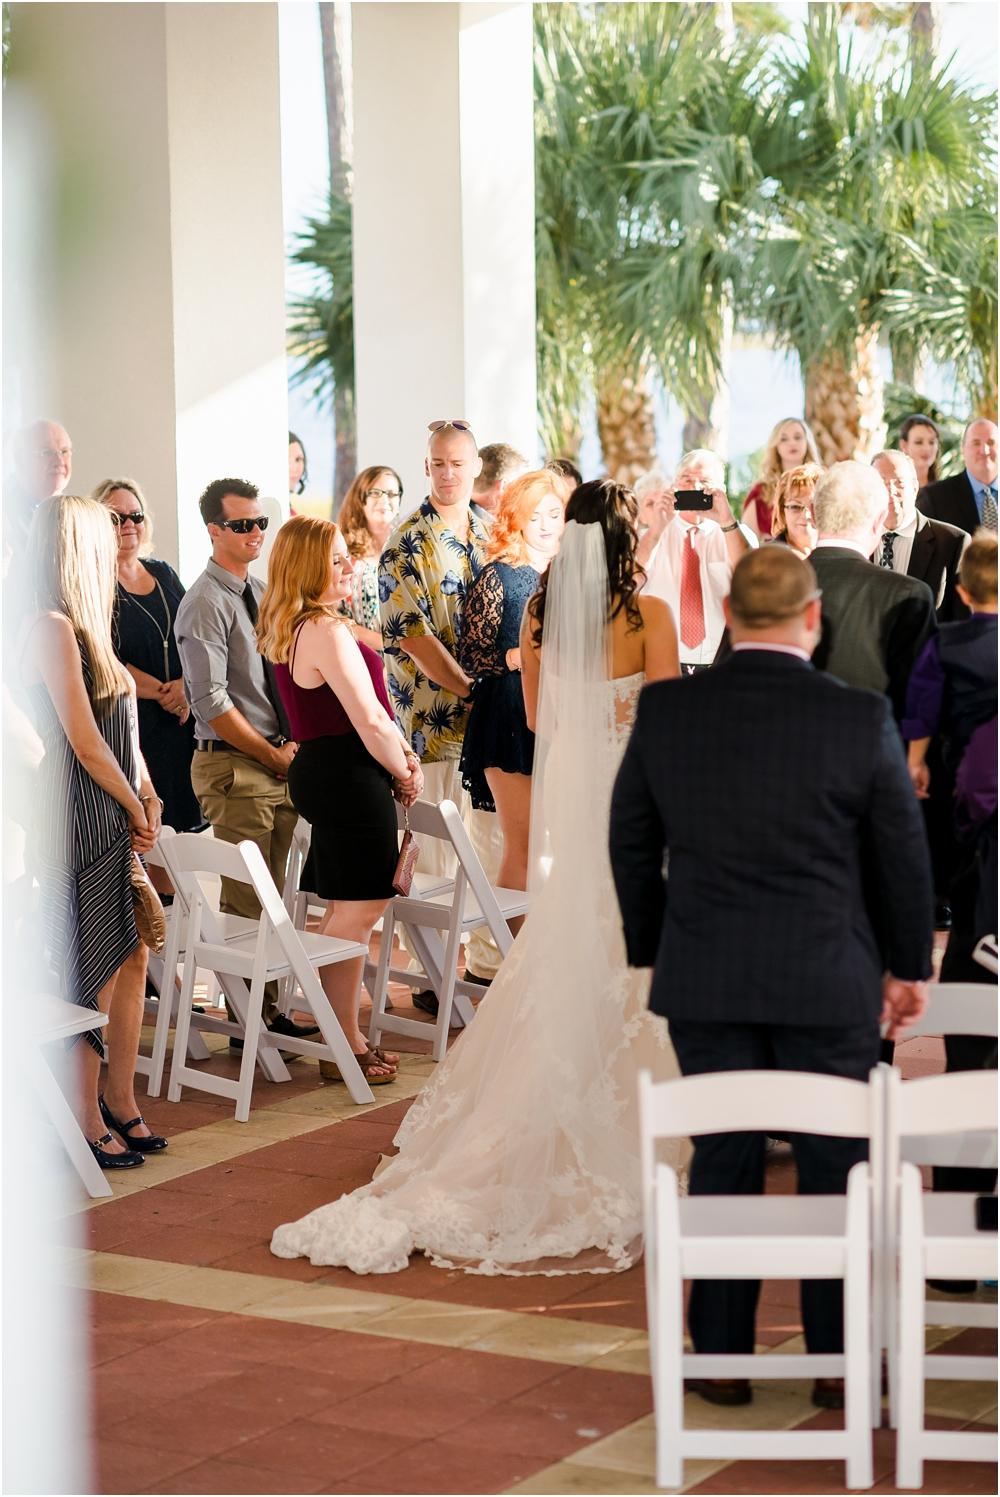 imhof-sheraton-panama-city-beach-florida-wedding-photographer-kiersten-grant-83.jpg